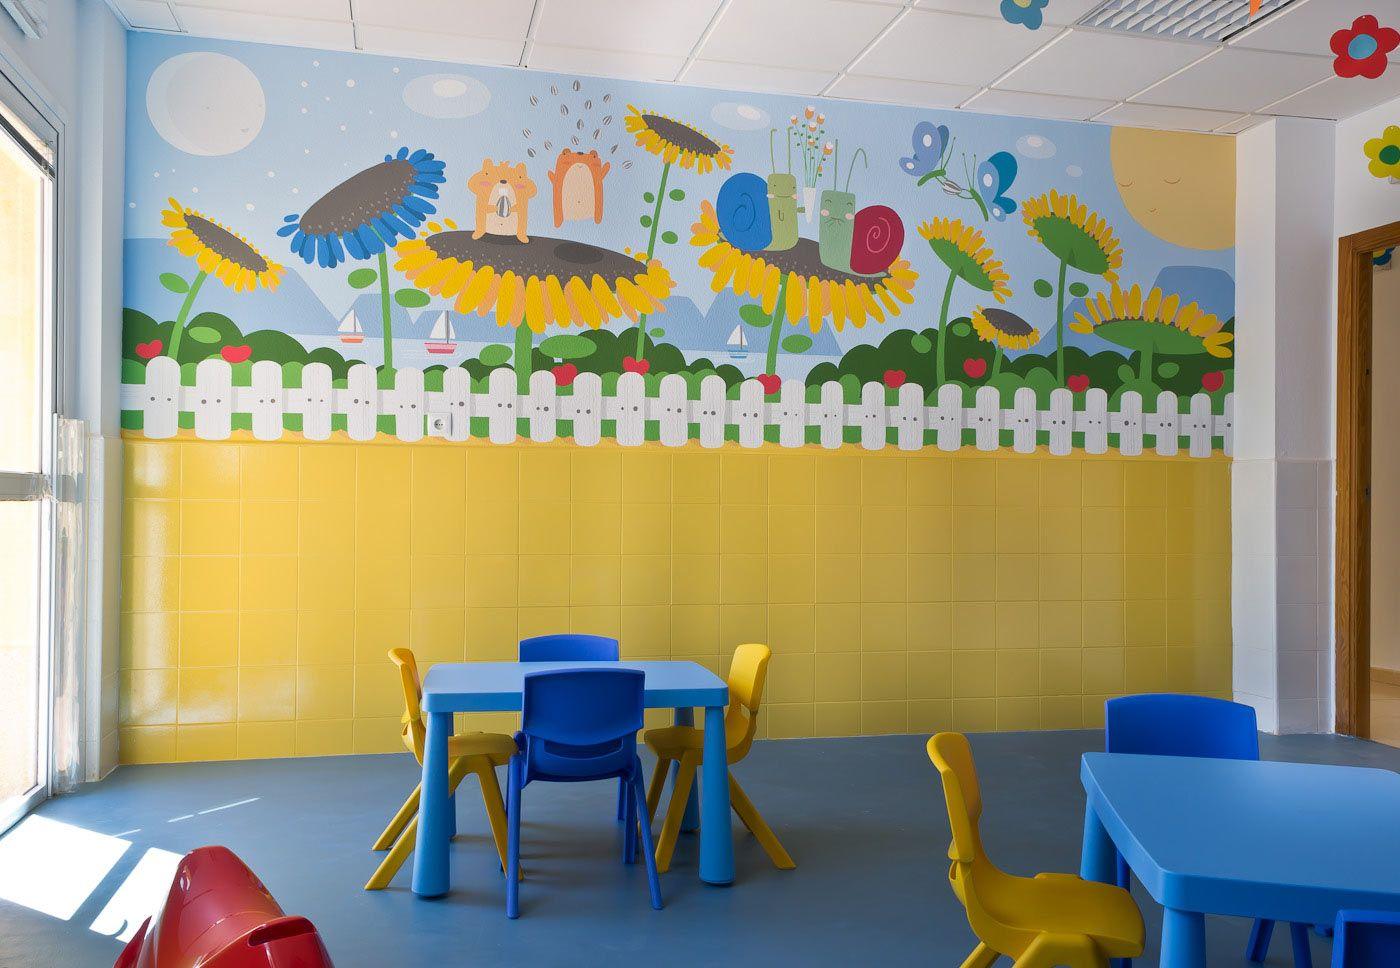 Murales para ni os colegios buscar con google murales for Murales decorativos